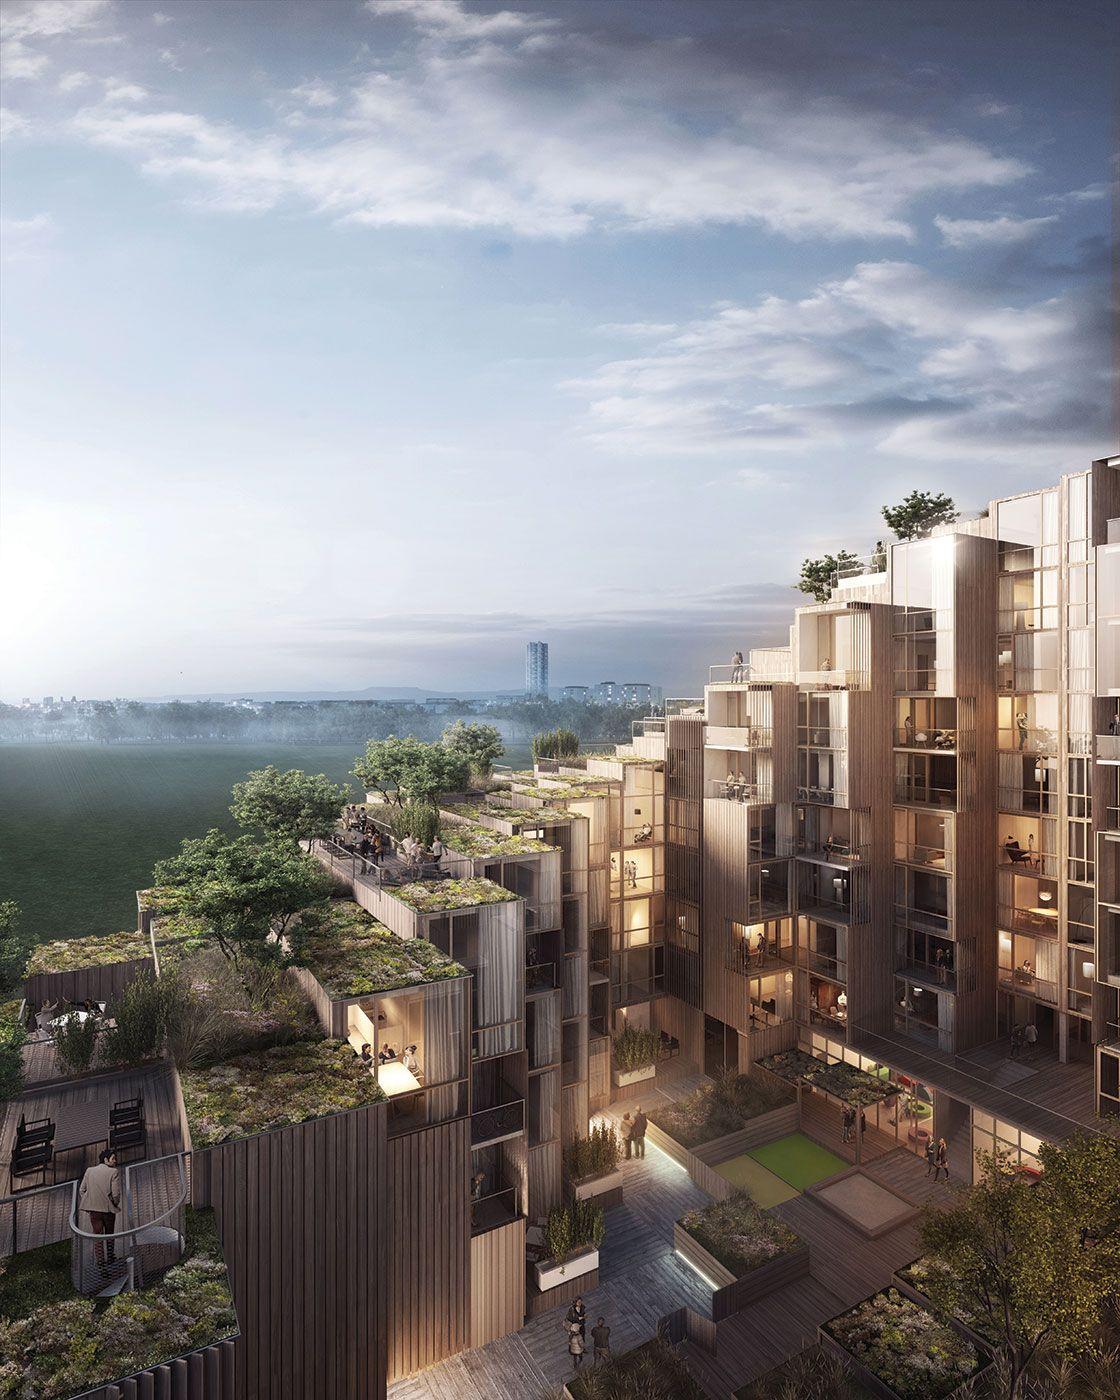 Oscar Properties #oscarproperties Stockholm, BIG, Terrace